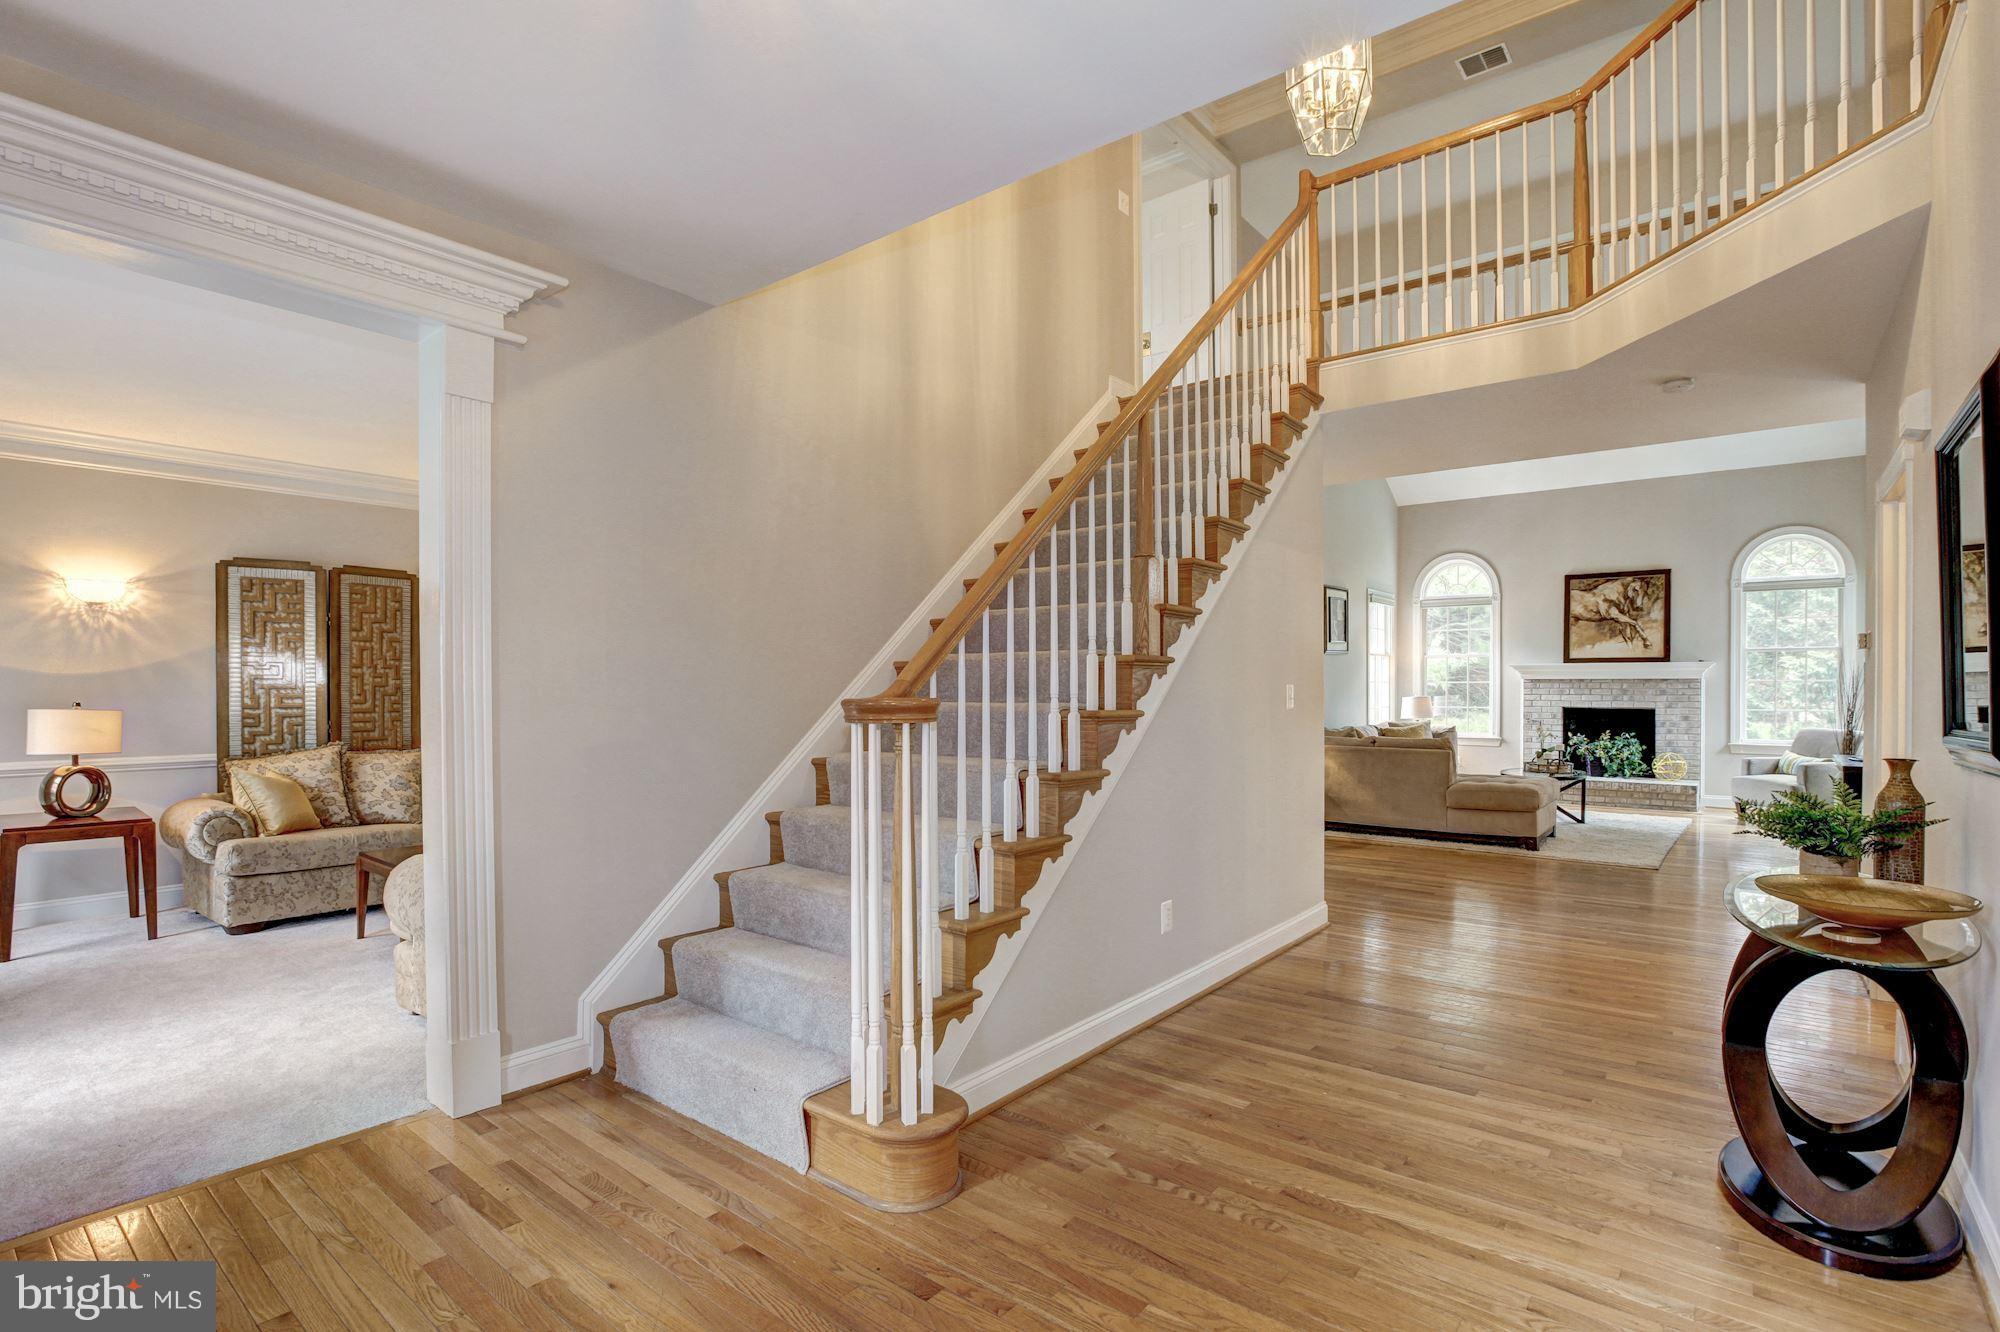 10212 DAPHNEY HOUSE WAY, ROCKVILLE, MD 20850